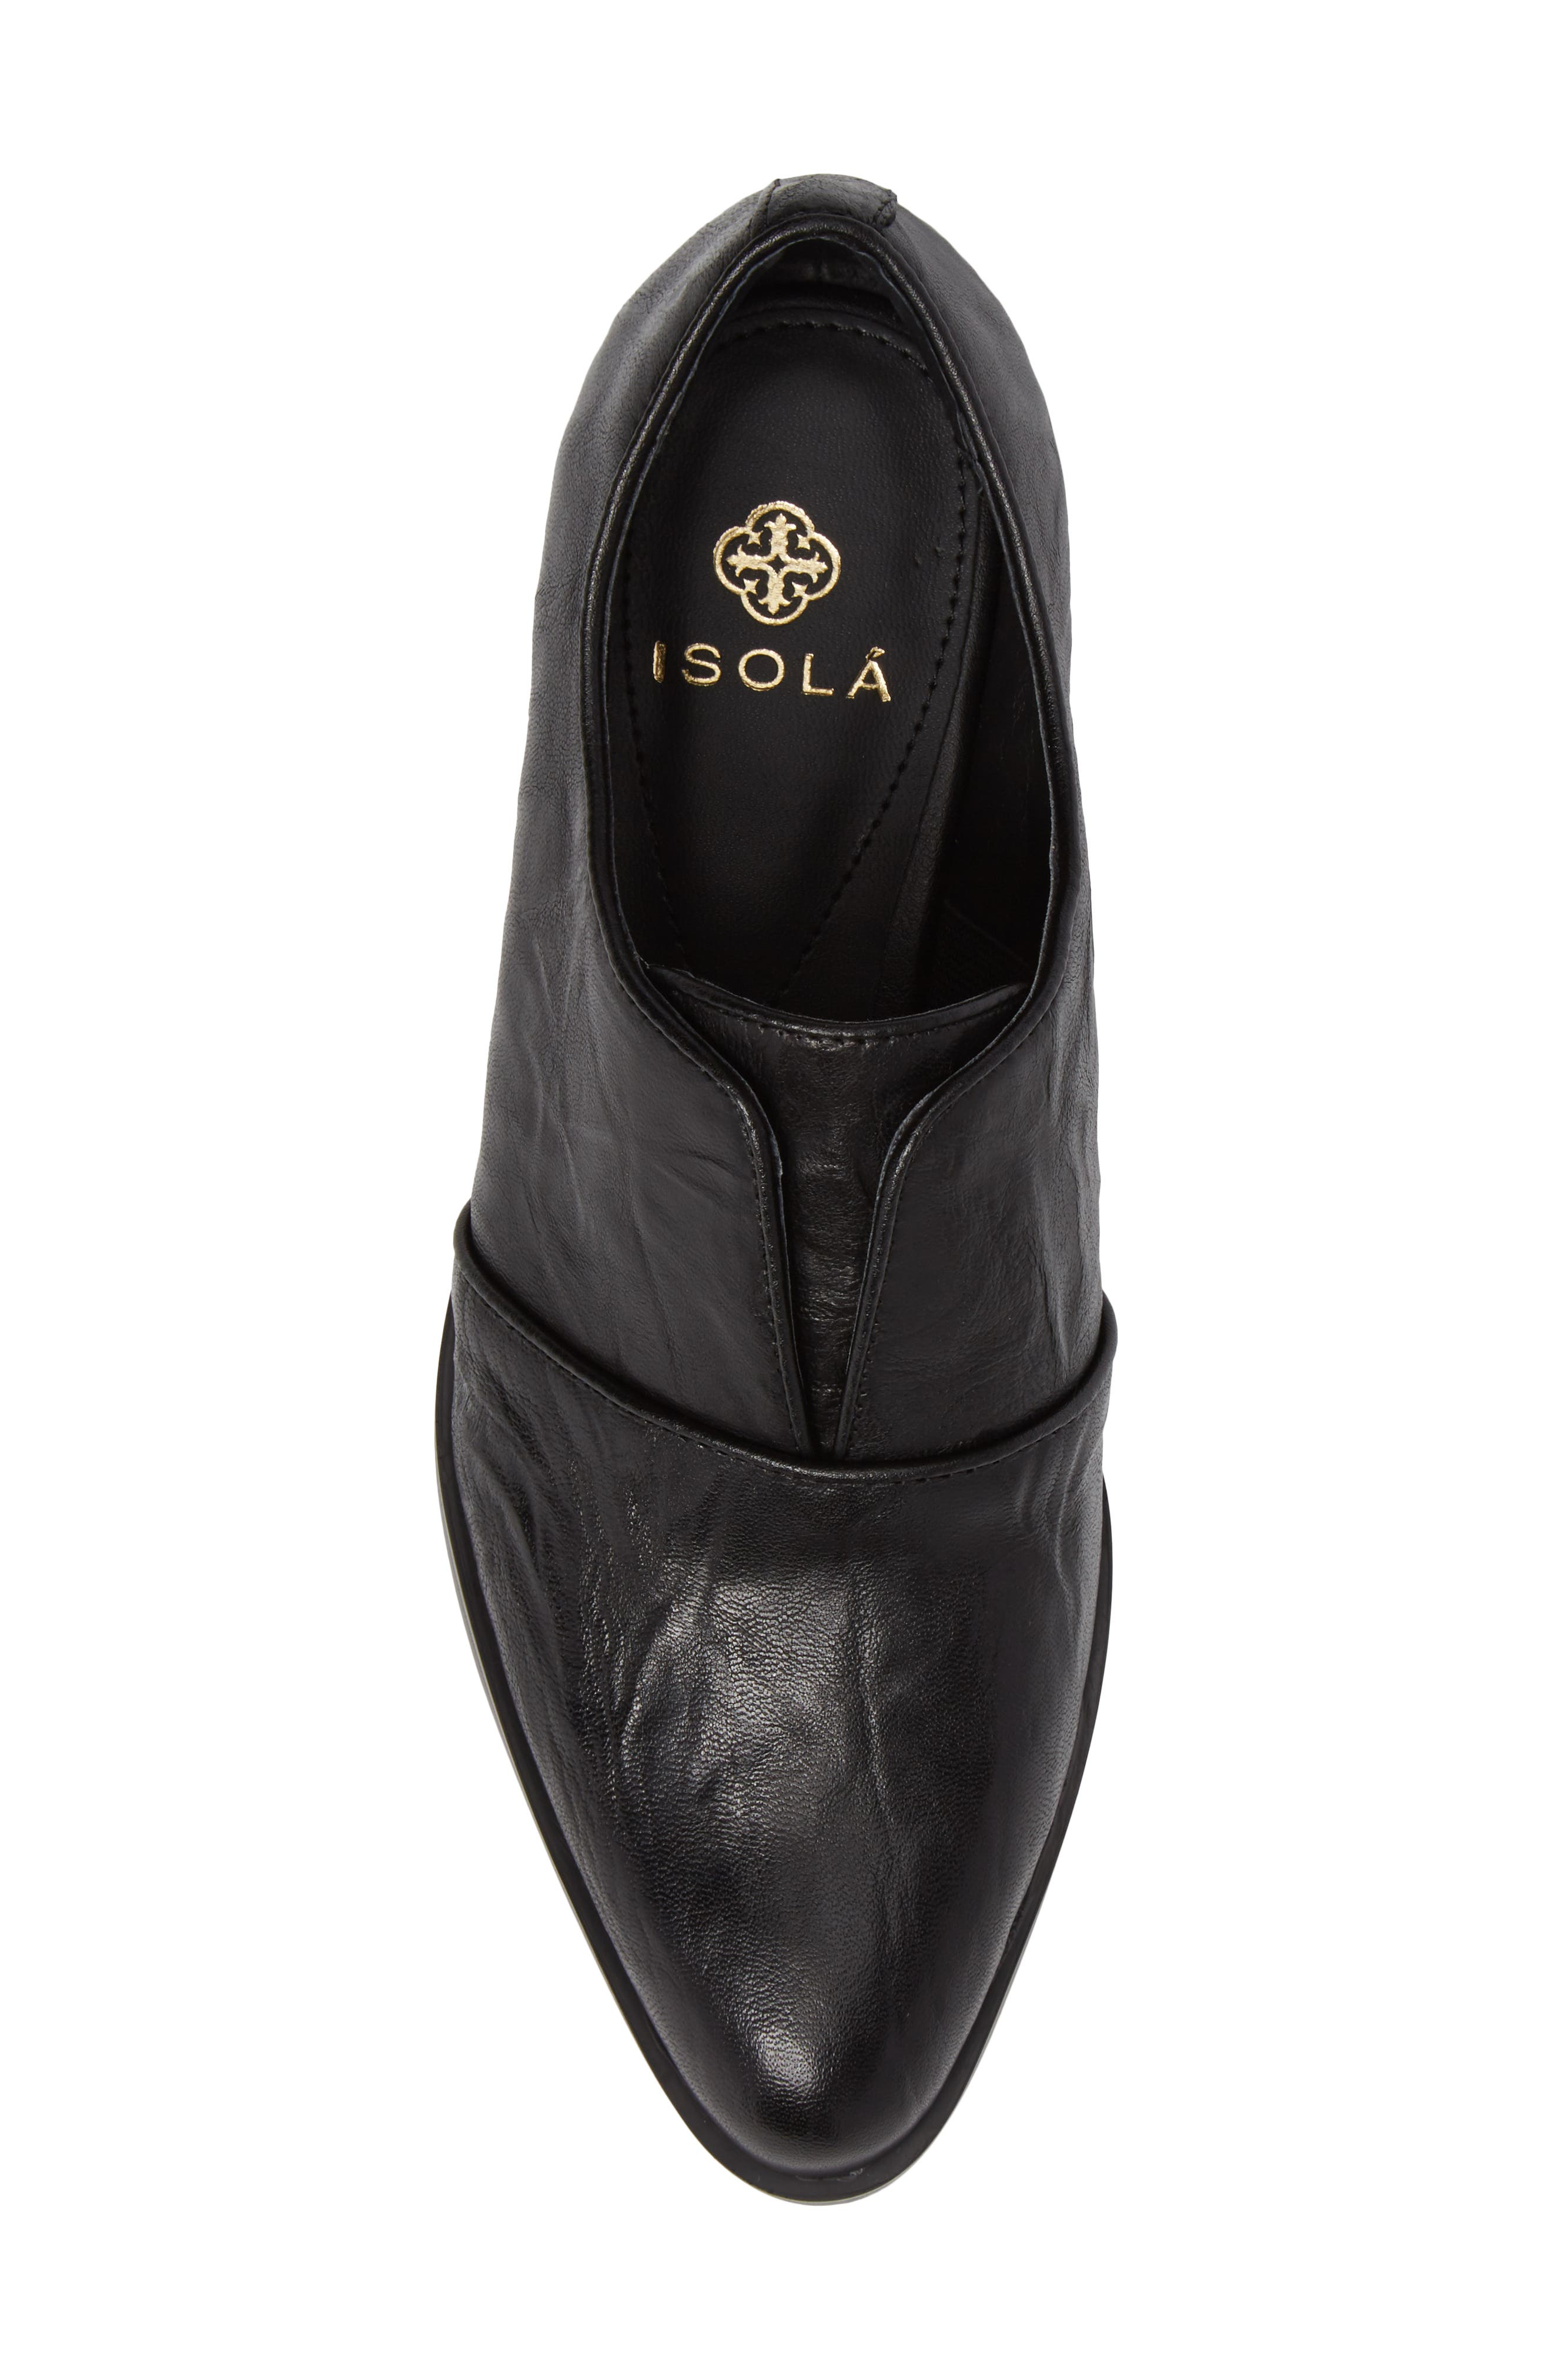 Isola Maria Slip-On Oxford,                             Alternate thumbnail 5, color,                             Black Leather